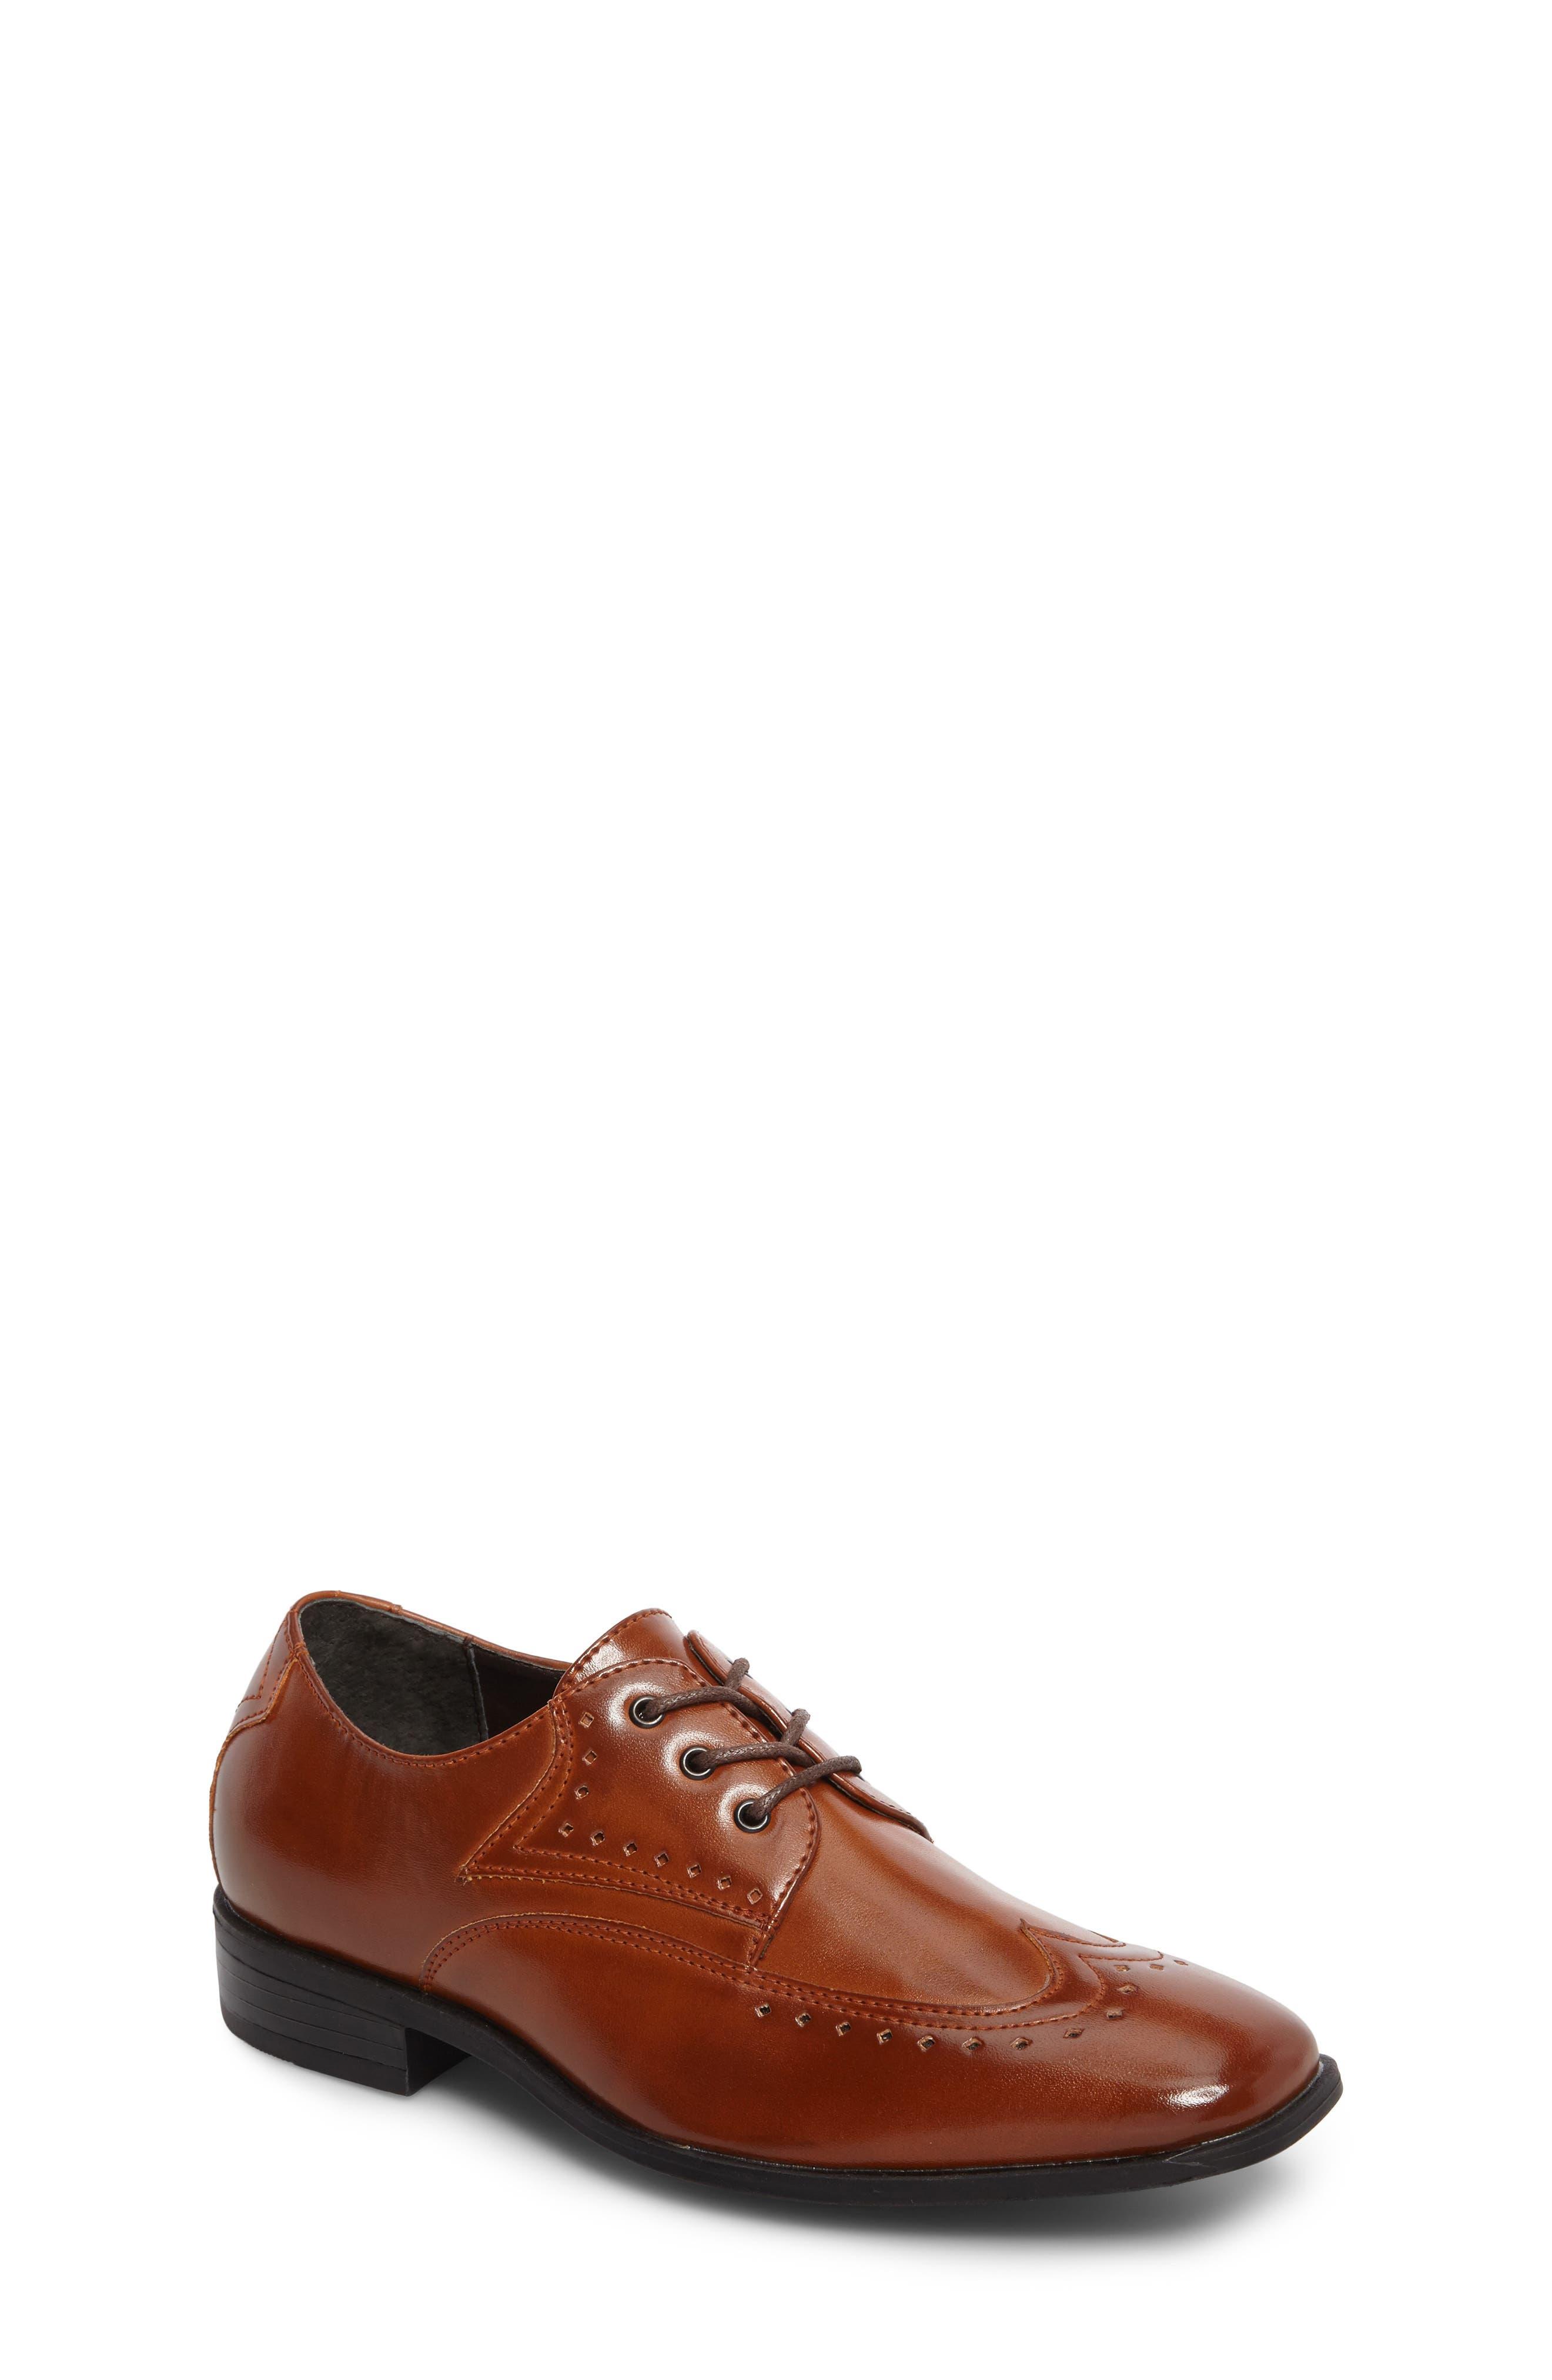 Atticus Square Toe Wingtip Oxford,                             Main thumbnail 1, color,                             Cognac